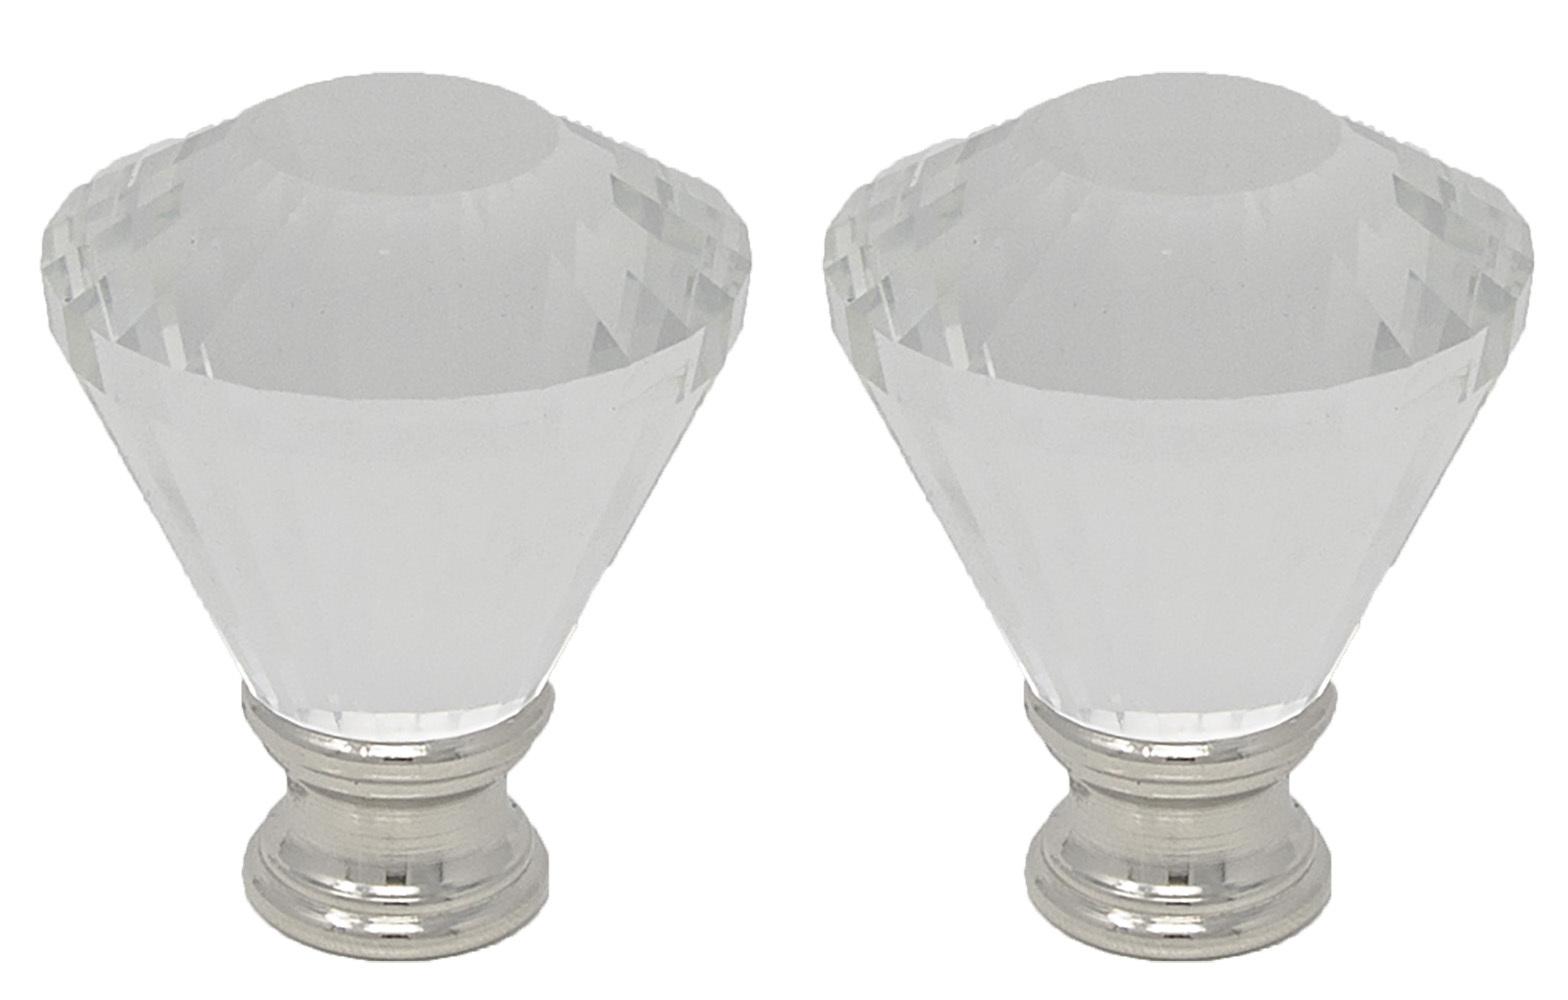 "Urbanest Crystal Diana Lamp Finial, 2"" Tall image 4"